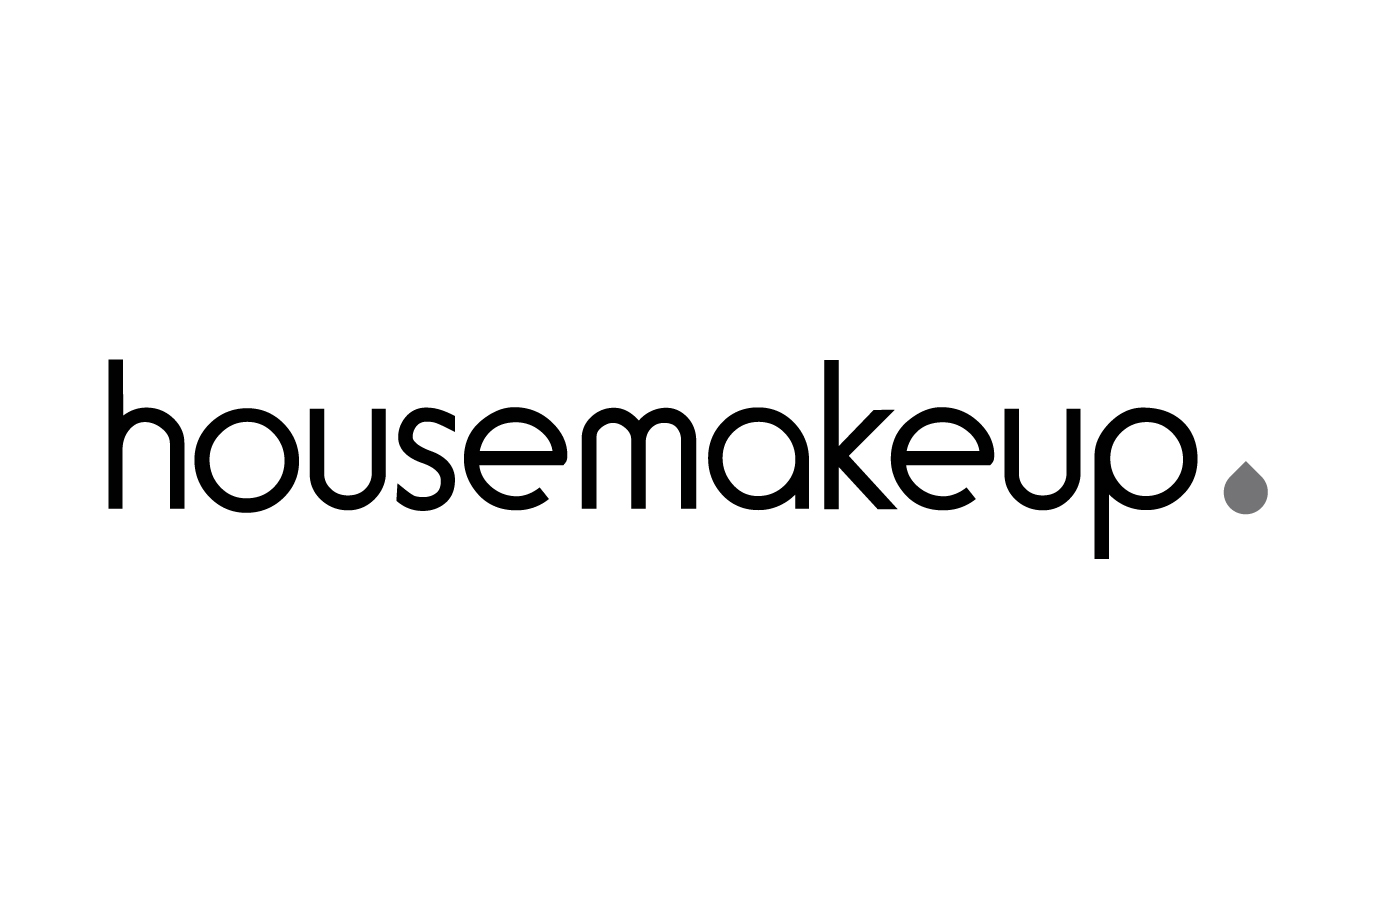 housemakeup_new-06